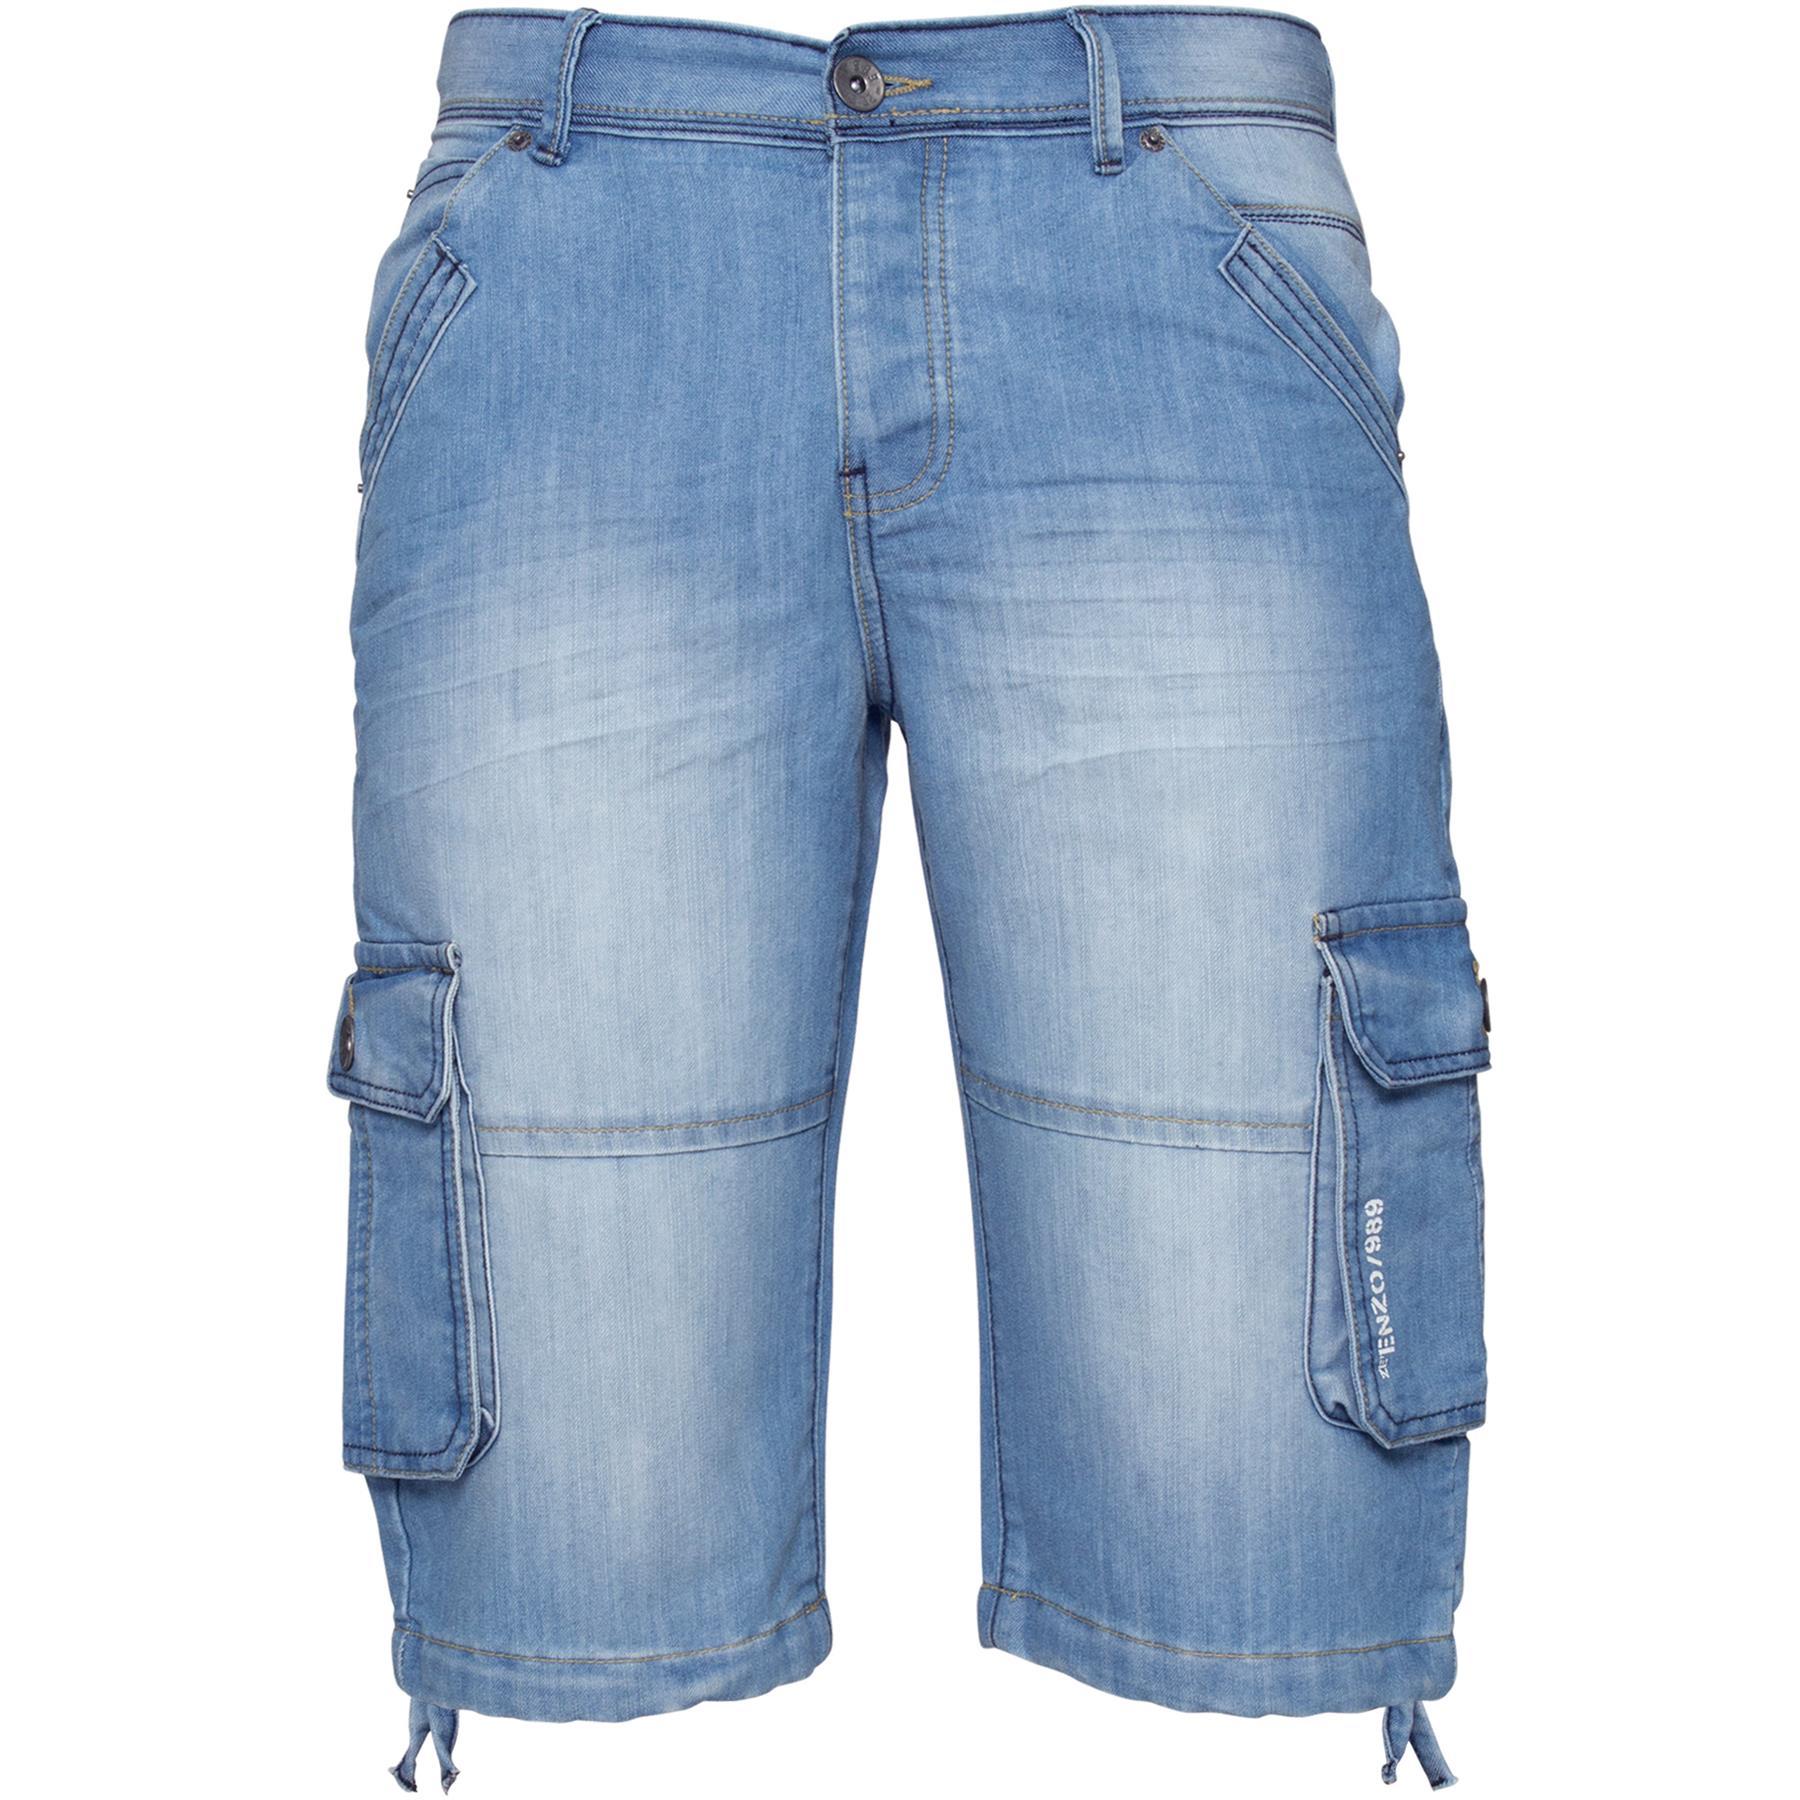 ENZO-Jeans-para-hombre-de-carga-combate-informal-de-verano-Shorts-Pantalones-Cortos-de-Jeans-Todas miniatura 11